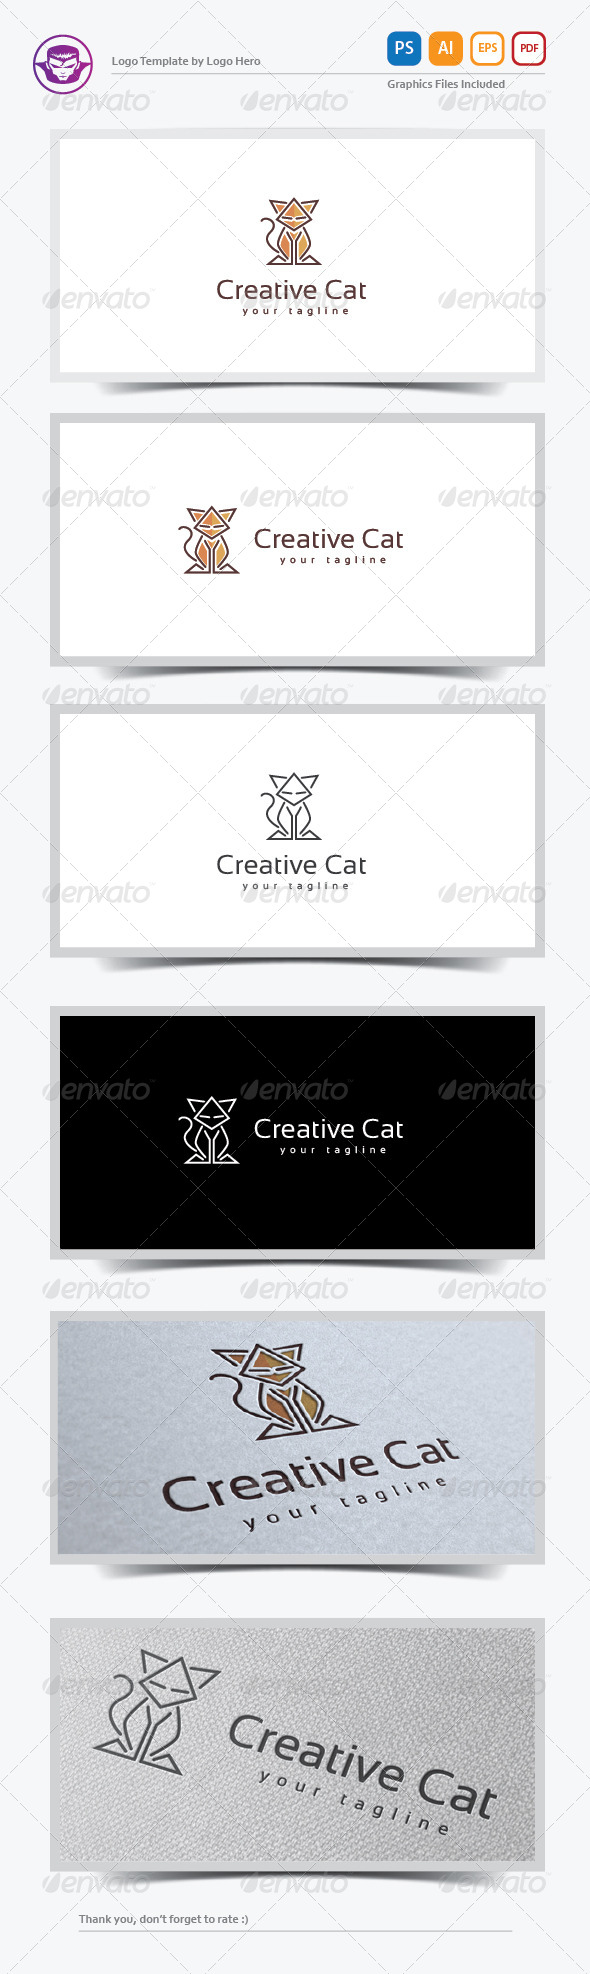 GraphicRiver Creative Cat Logo Template 8160750